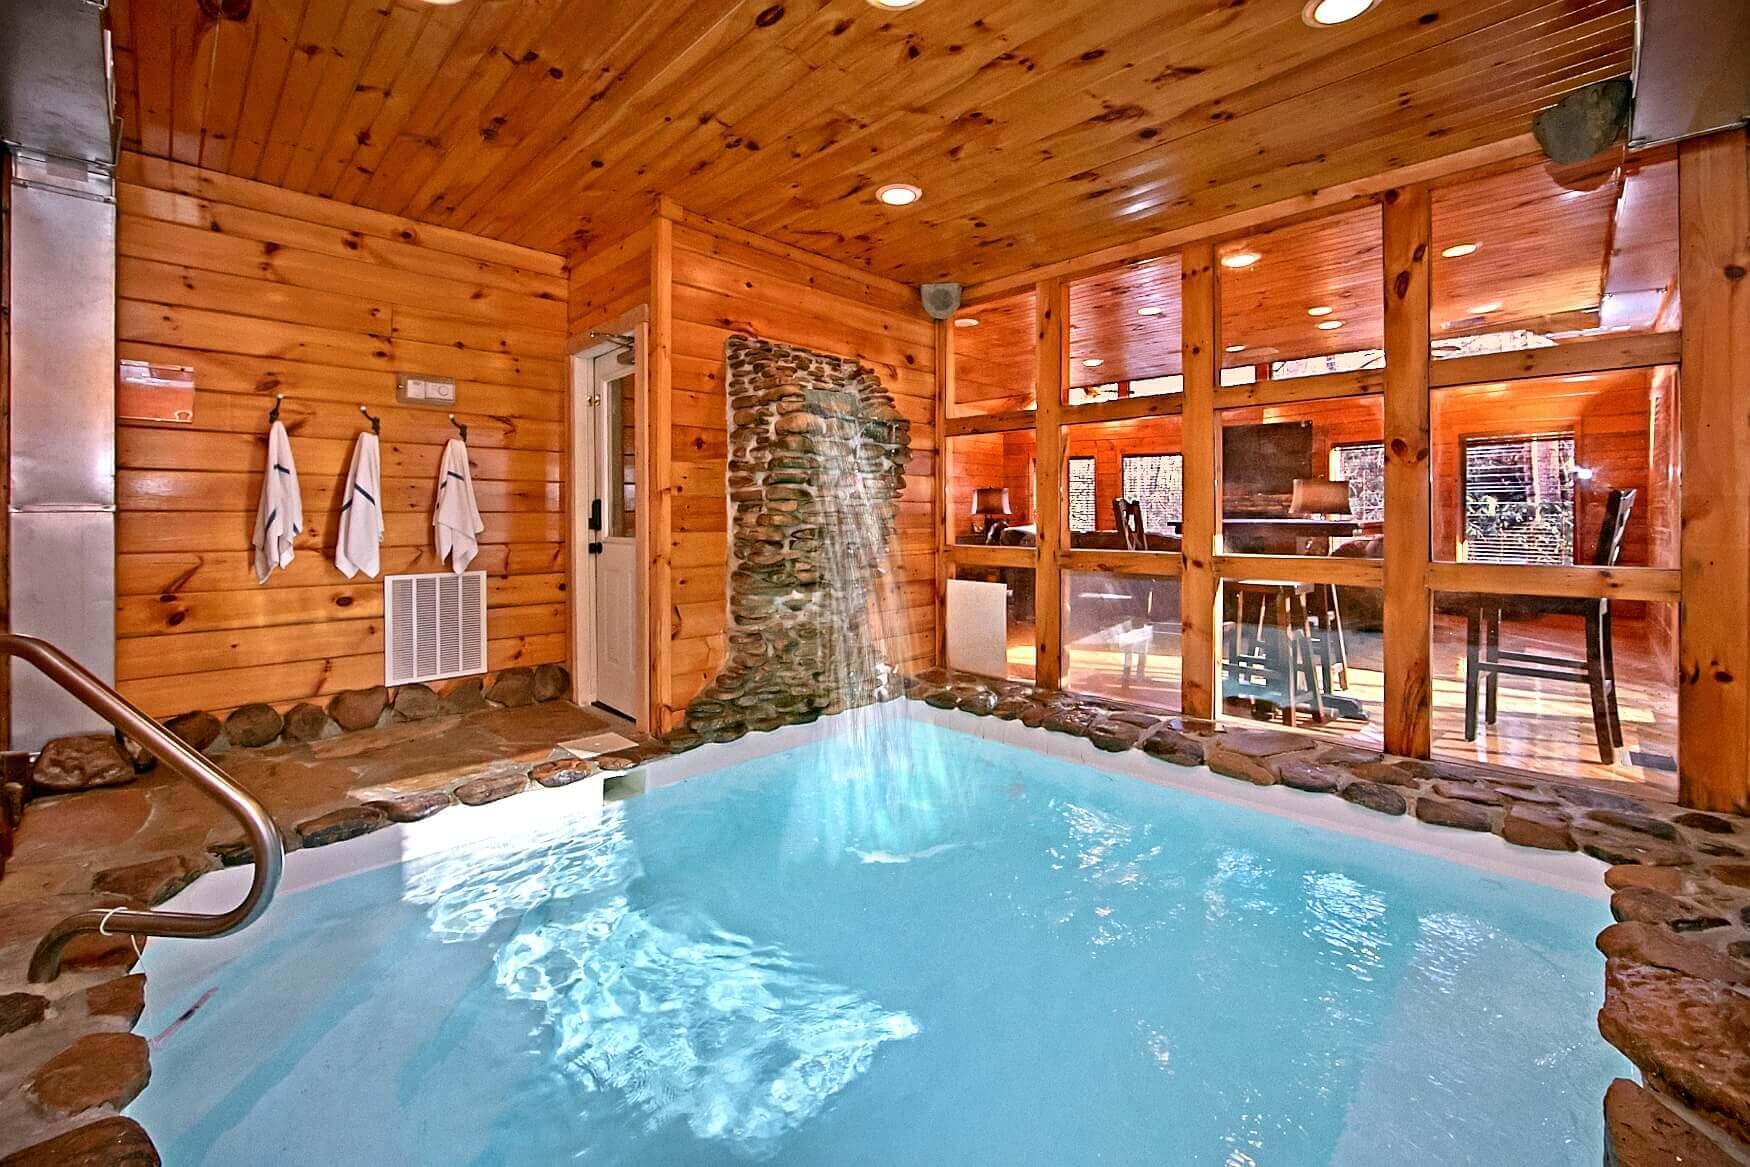 2 Bedroom Cabins in Gatlinburg TN for Rent Elk Springs Resort